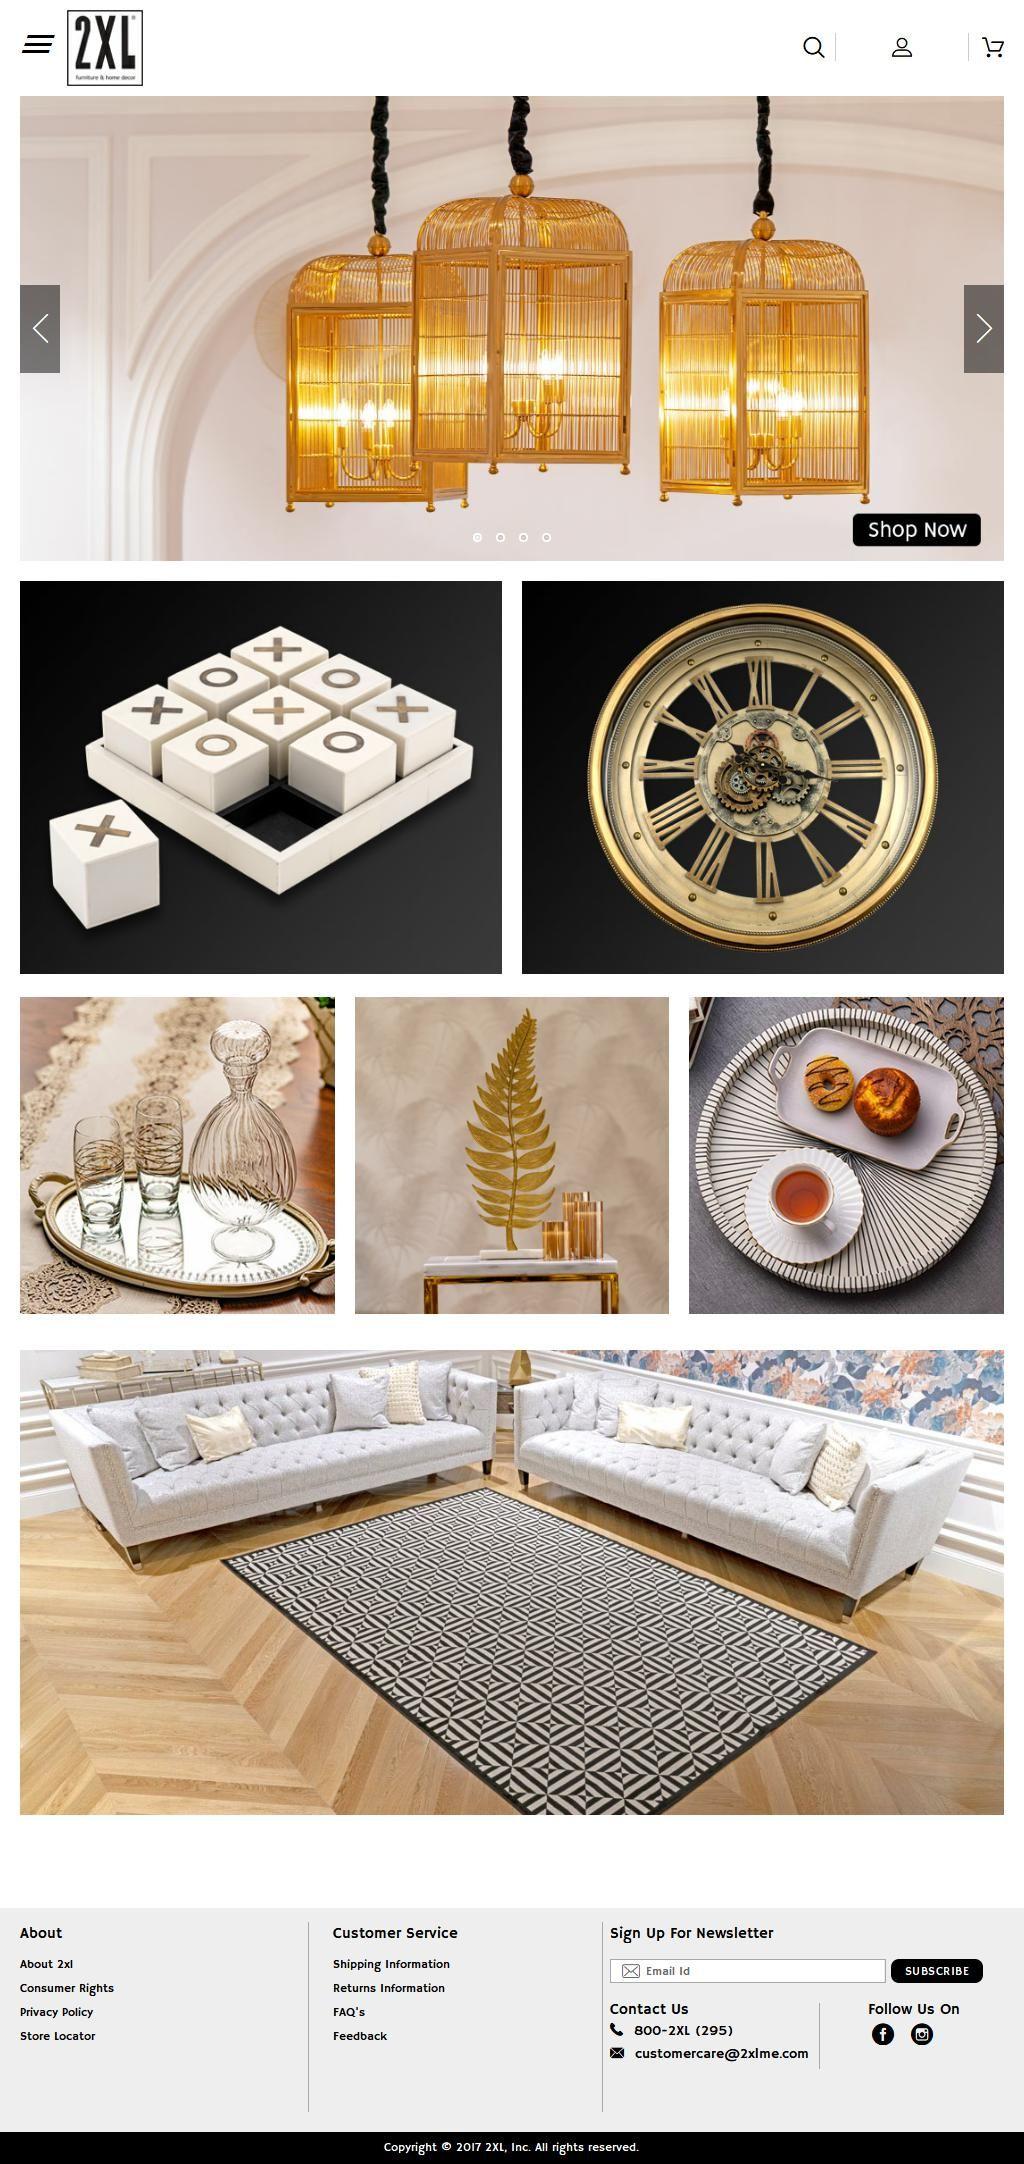 2xl Furniture Home Decor Showroom Al Ghurair Centre 3 Al Rigga